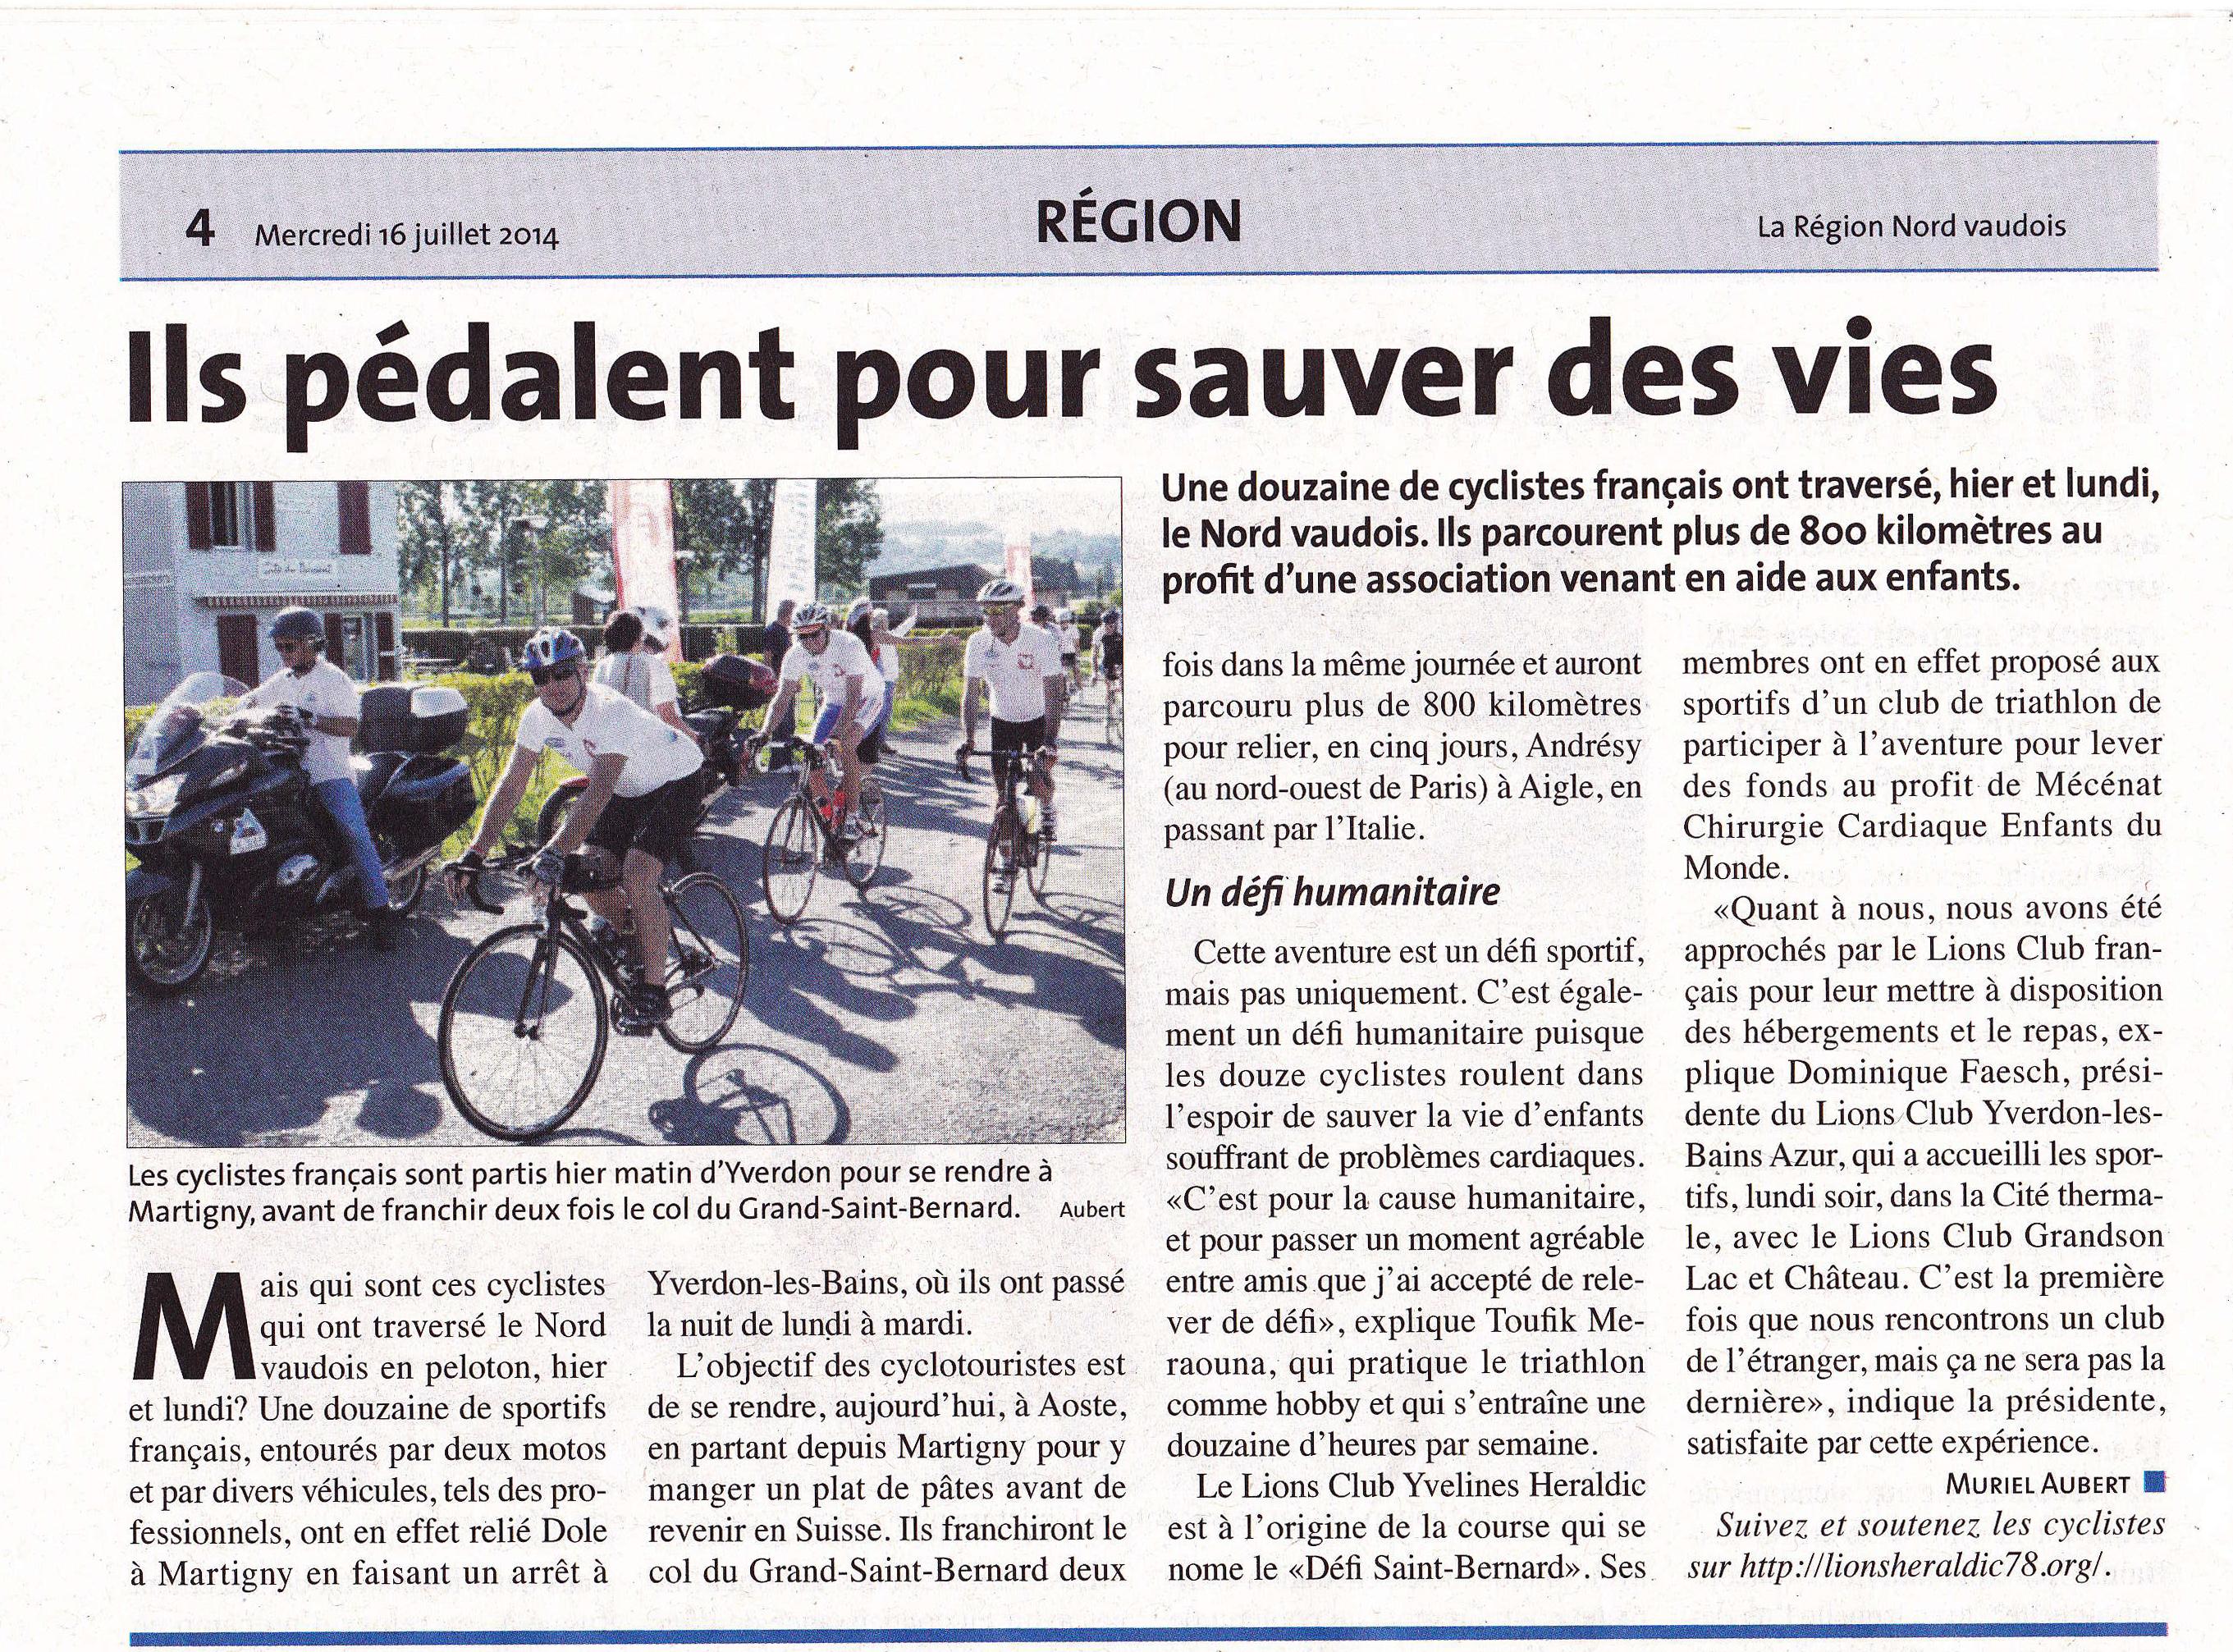 La r gion nord vaudois lions club yvelines heraldic for Yvelines actives